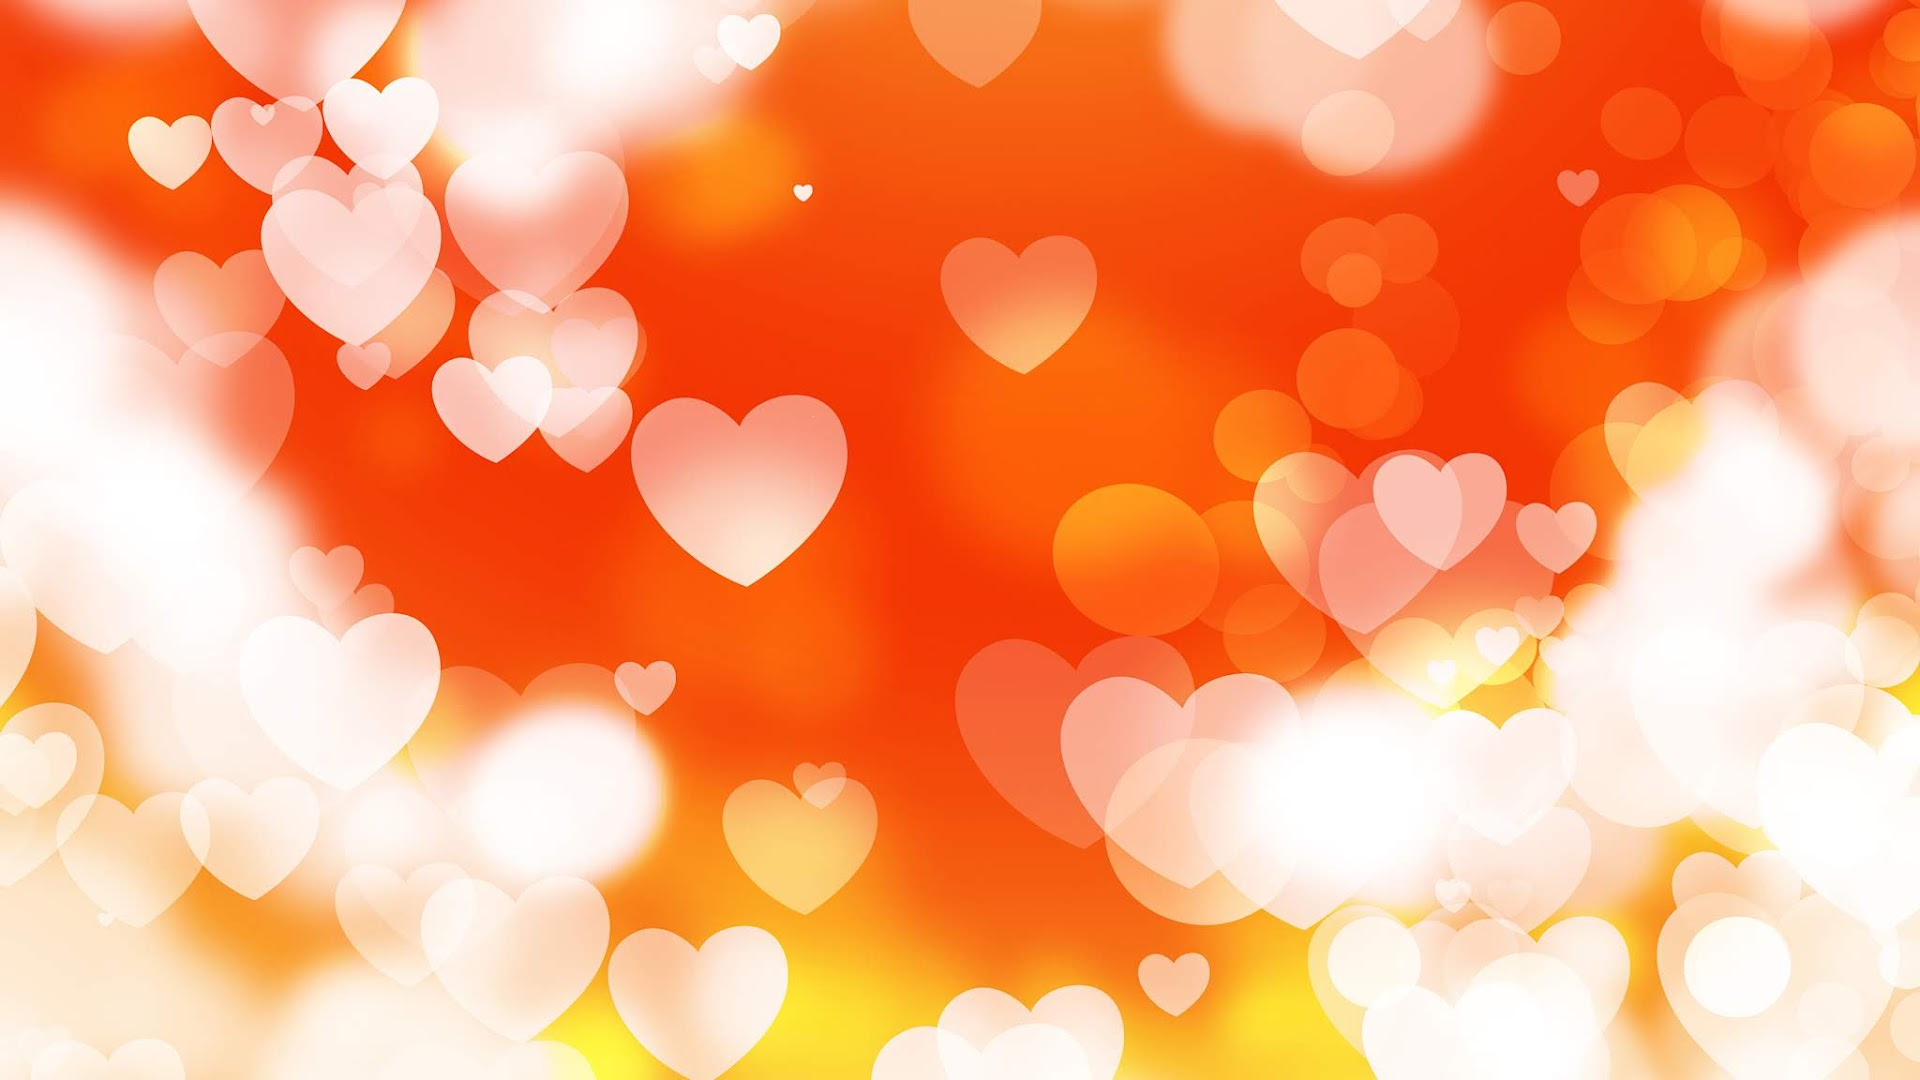 Bokah Hearts oft Background